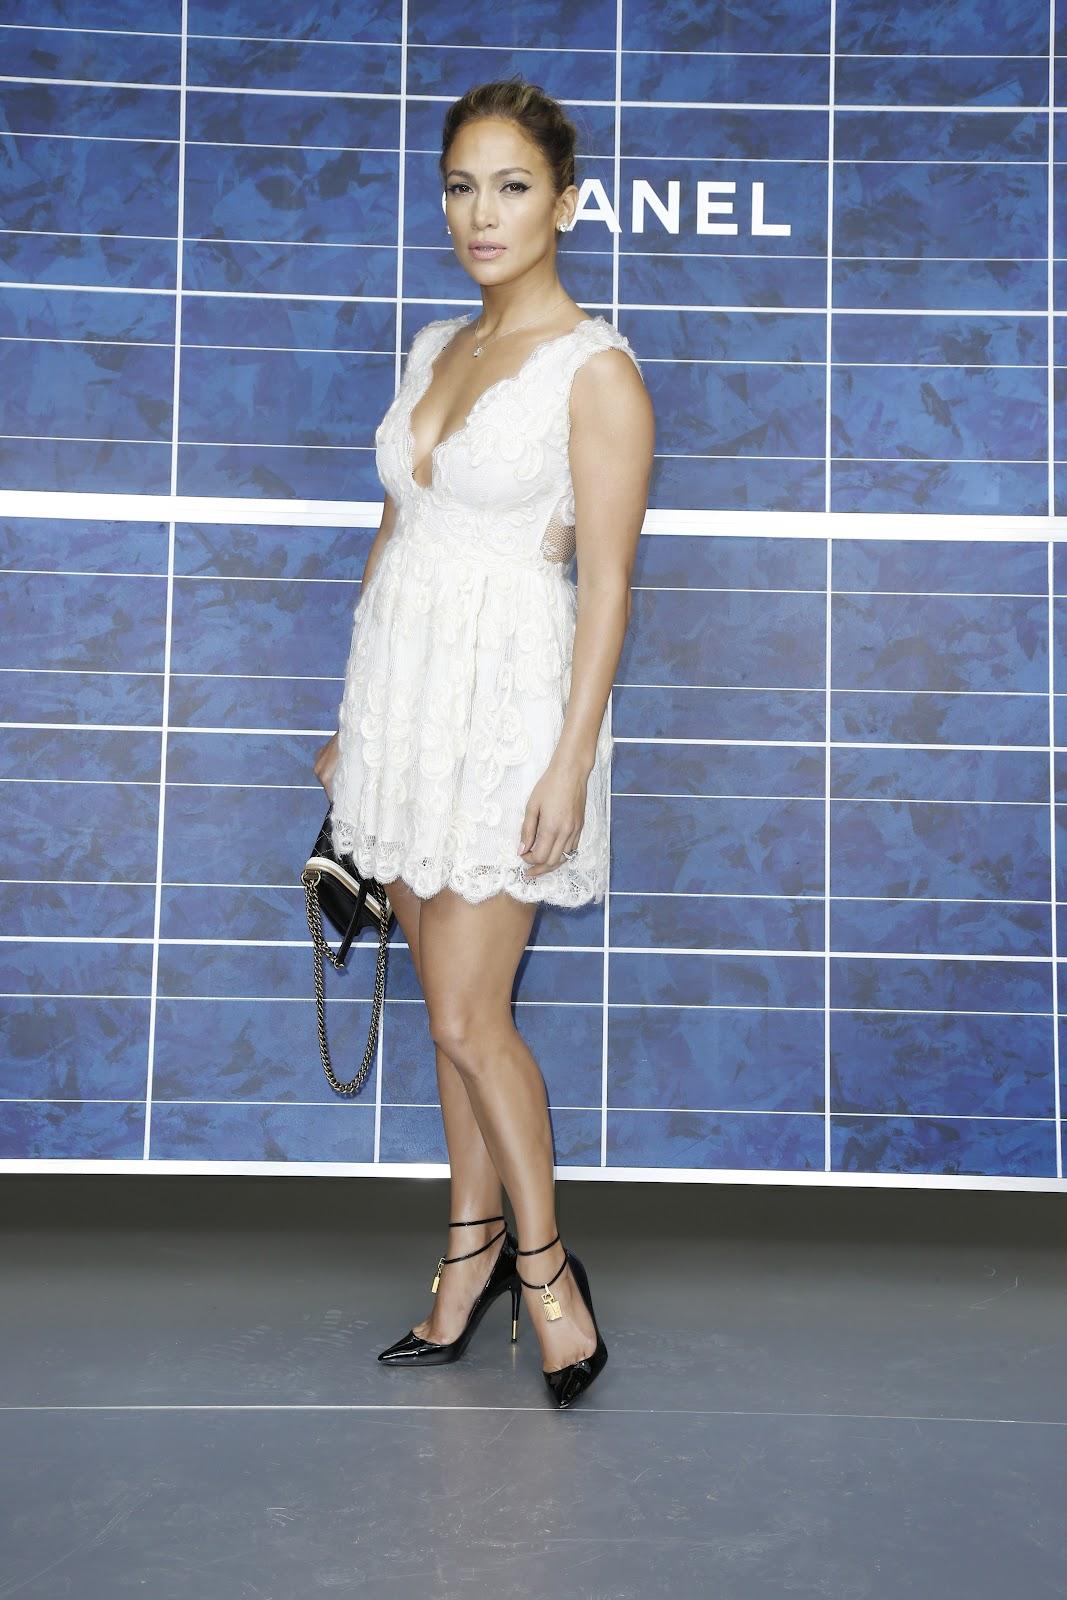 http://1.bp.blogspot.com/-MQ22v-HpIo0/UGrtRmElvVI/AAAAAAAAP6I/lx40bc_ZvKE/s1600/Jennifer+Lopez++October+2012+%27Chanel%27+Fashion+Show+-+08.jpg